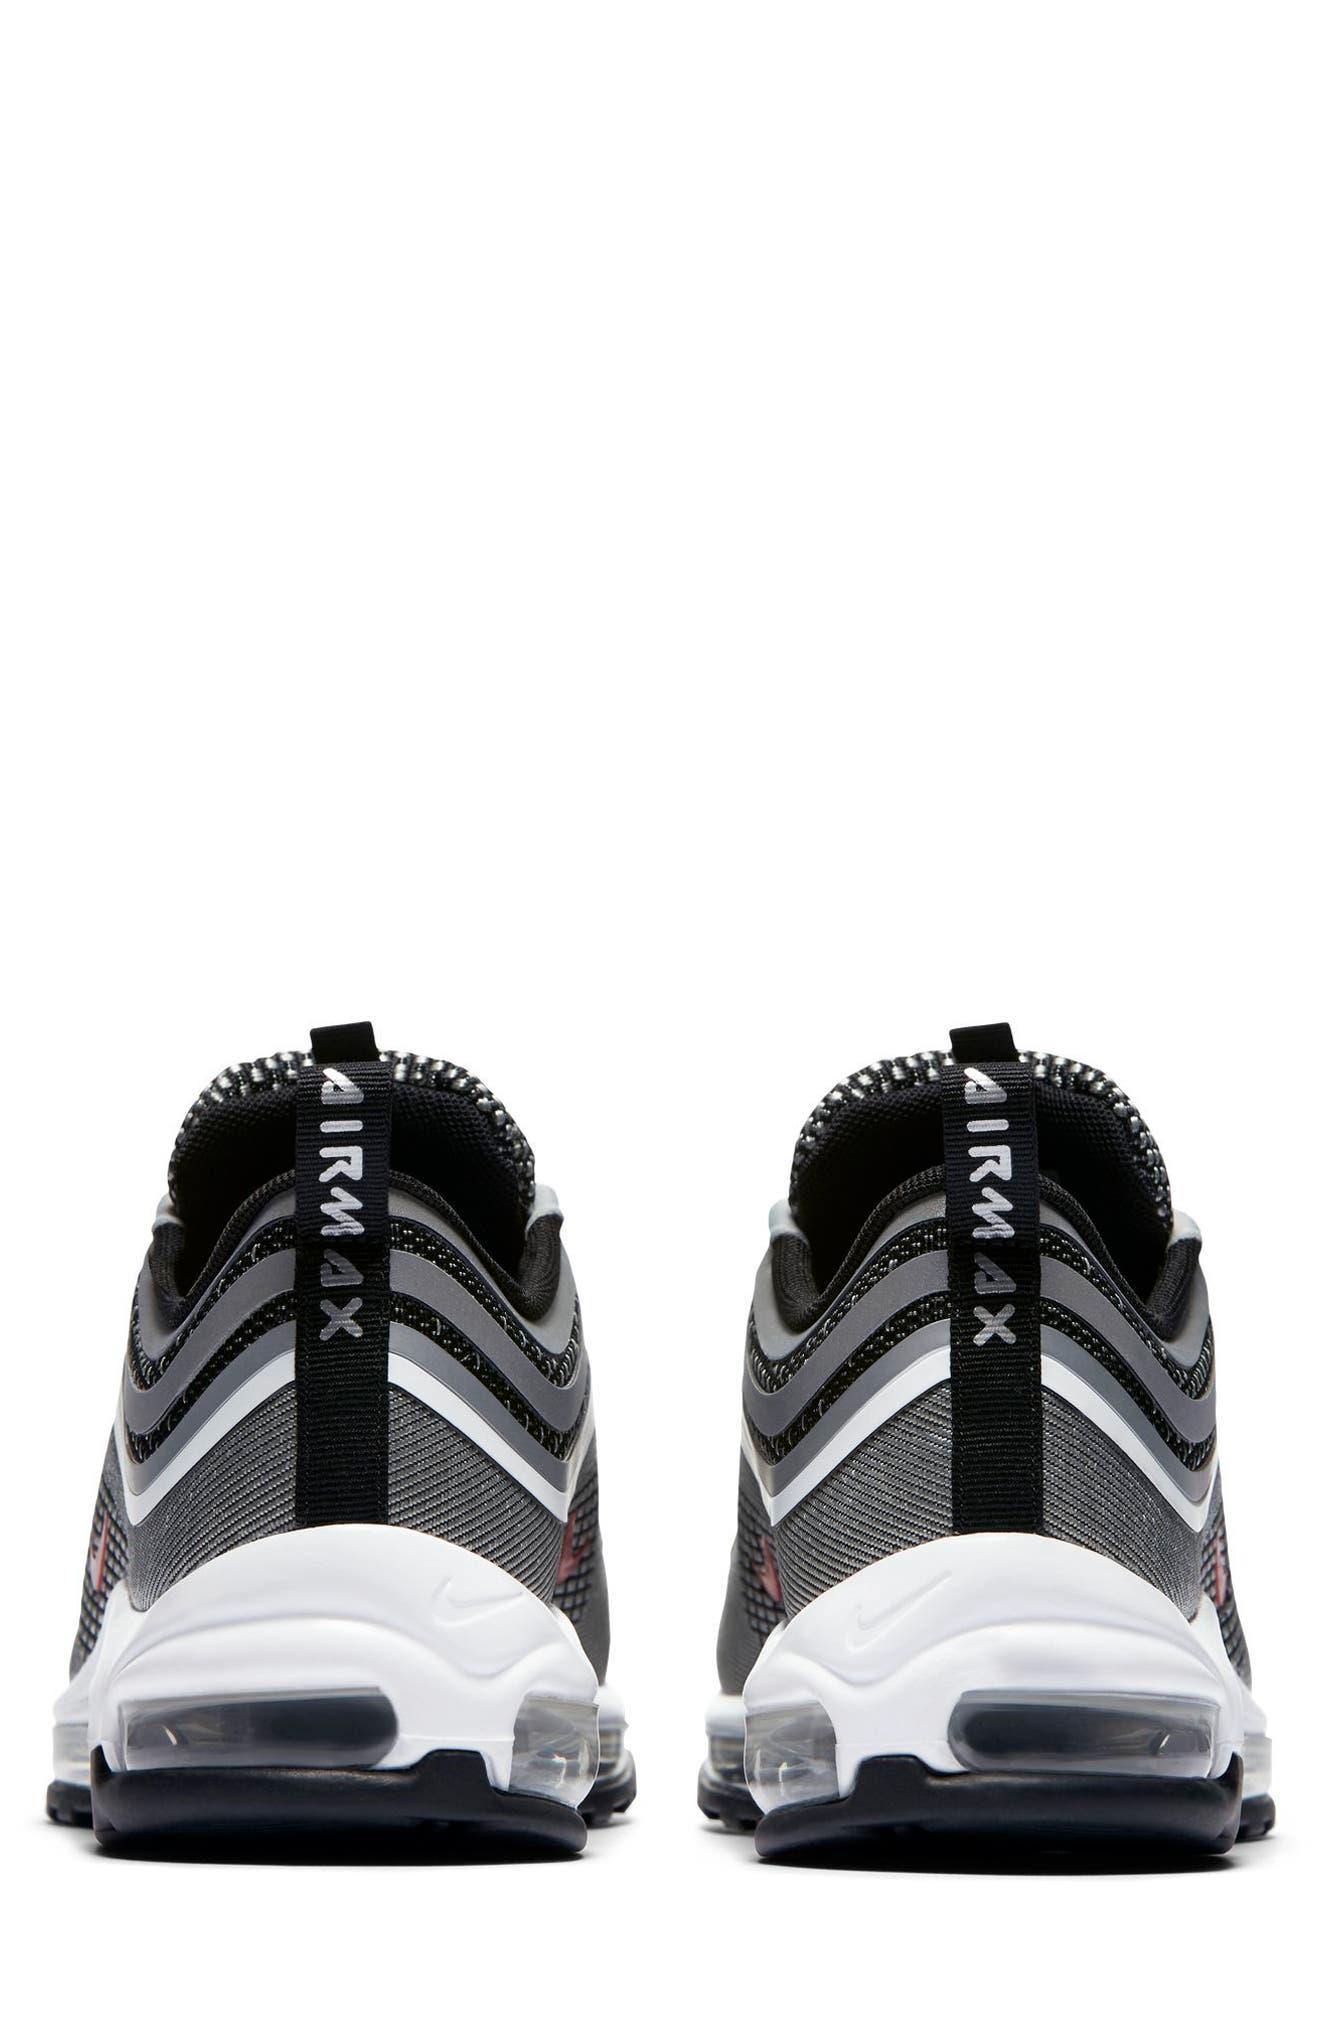 Air Max 97 Ultralight 2017 Sneaker,                             Alternate thumbnail 4, color,                             Metallic Silver/ Varsity Red